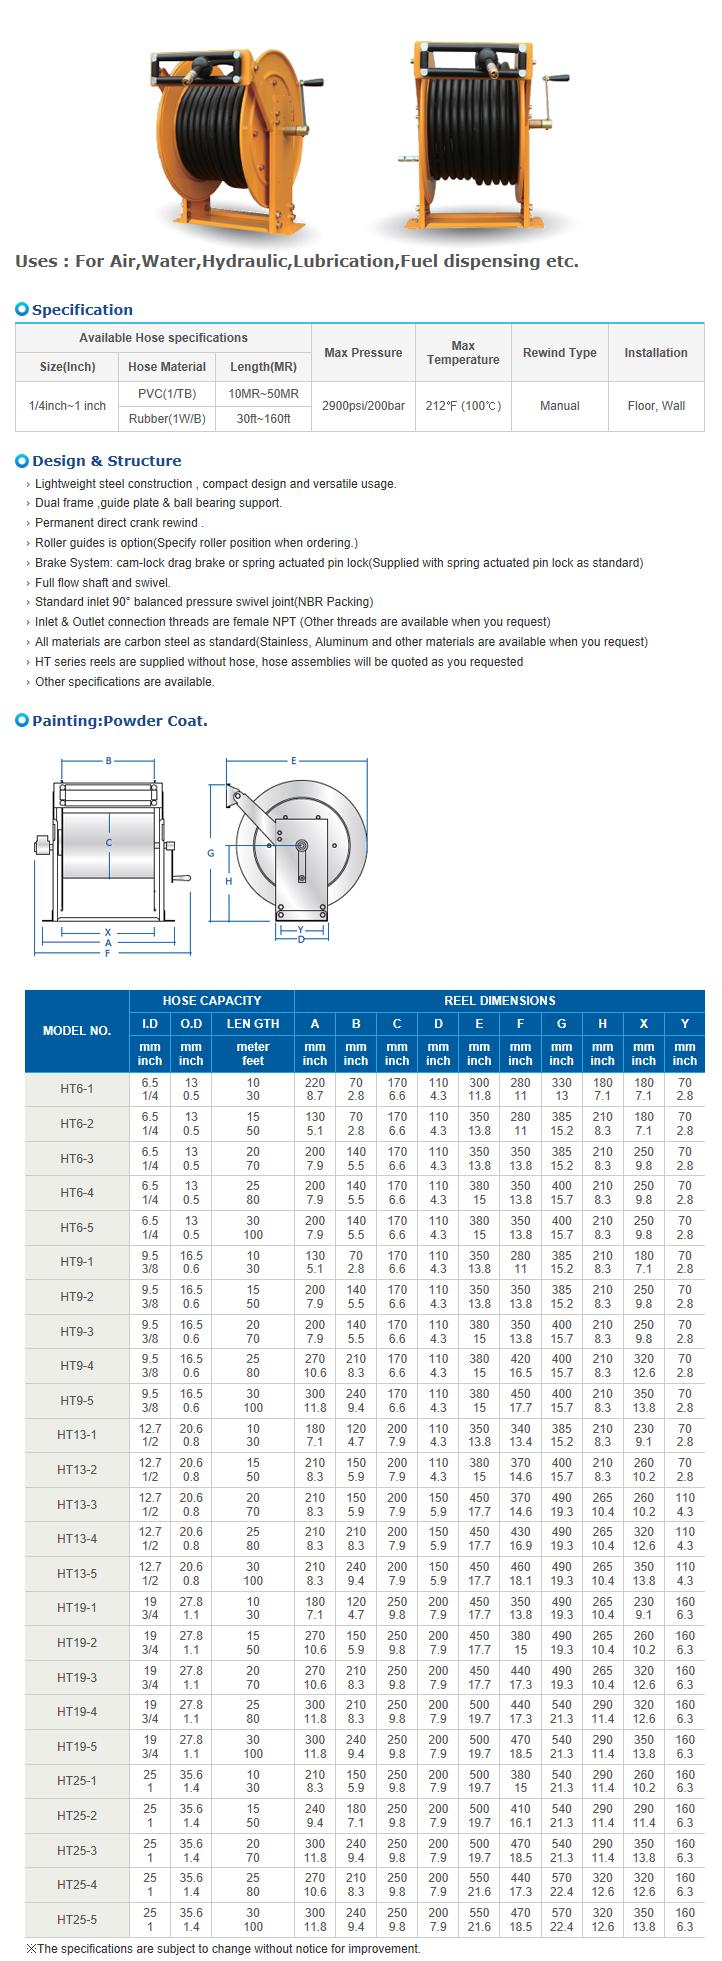 REEL TECH Manual Rewind Type HT-Series